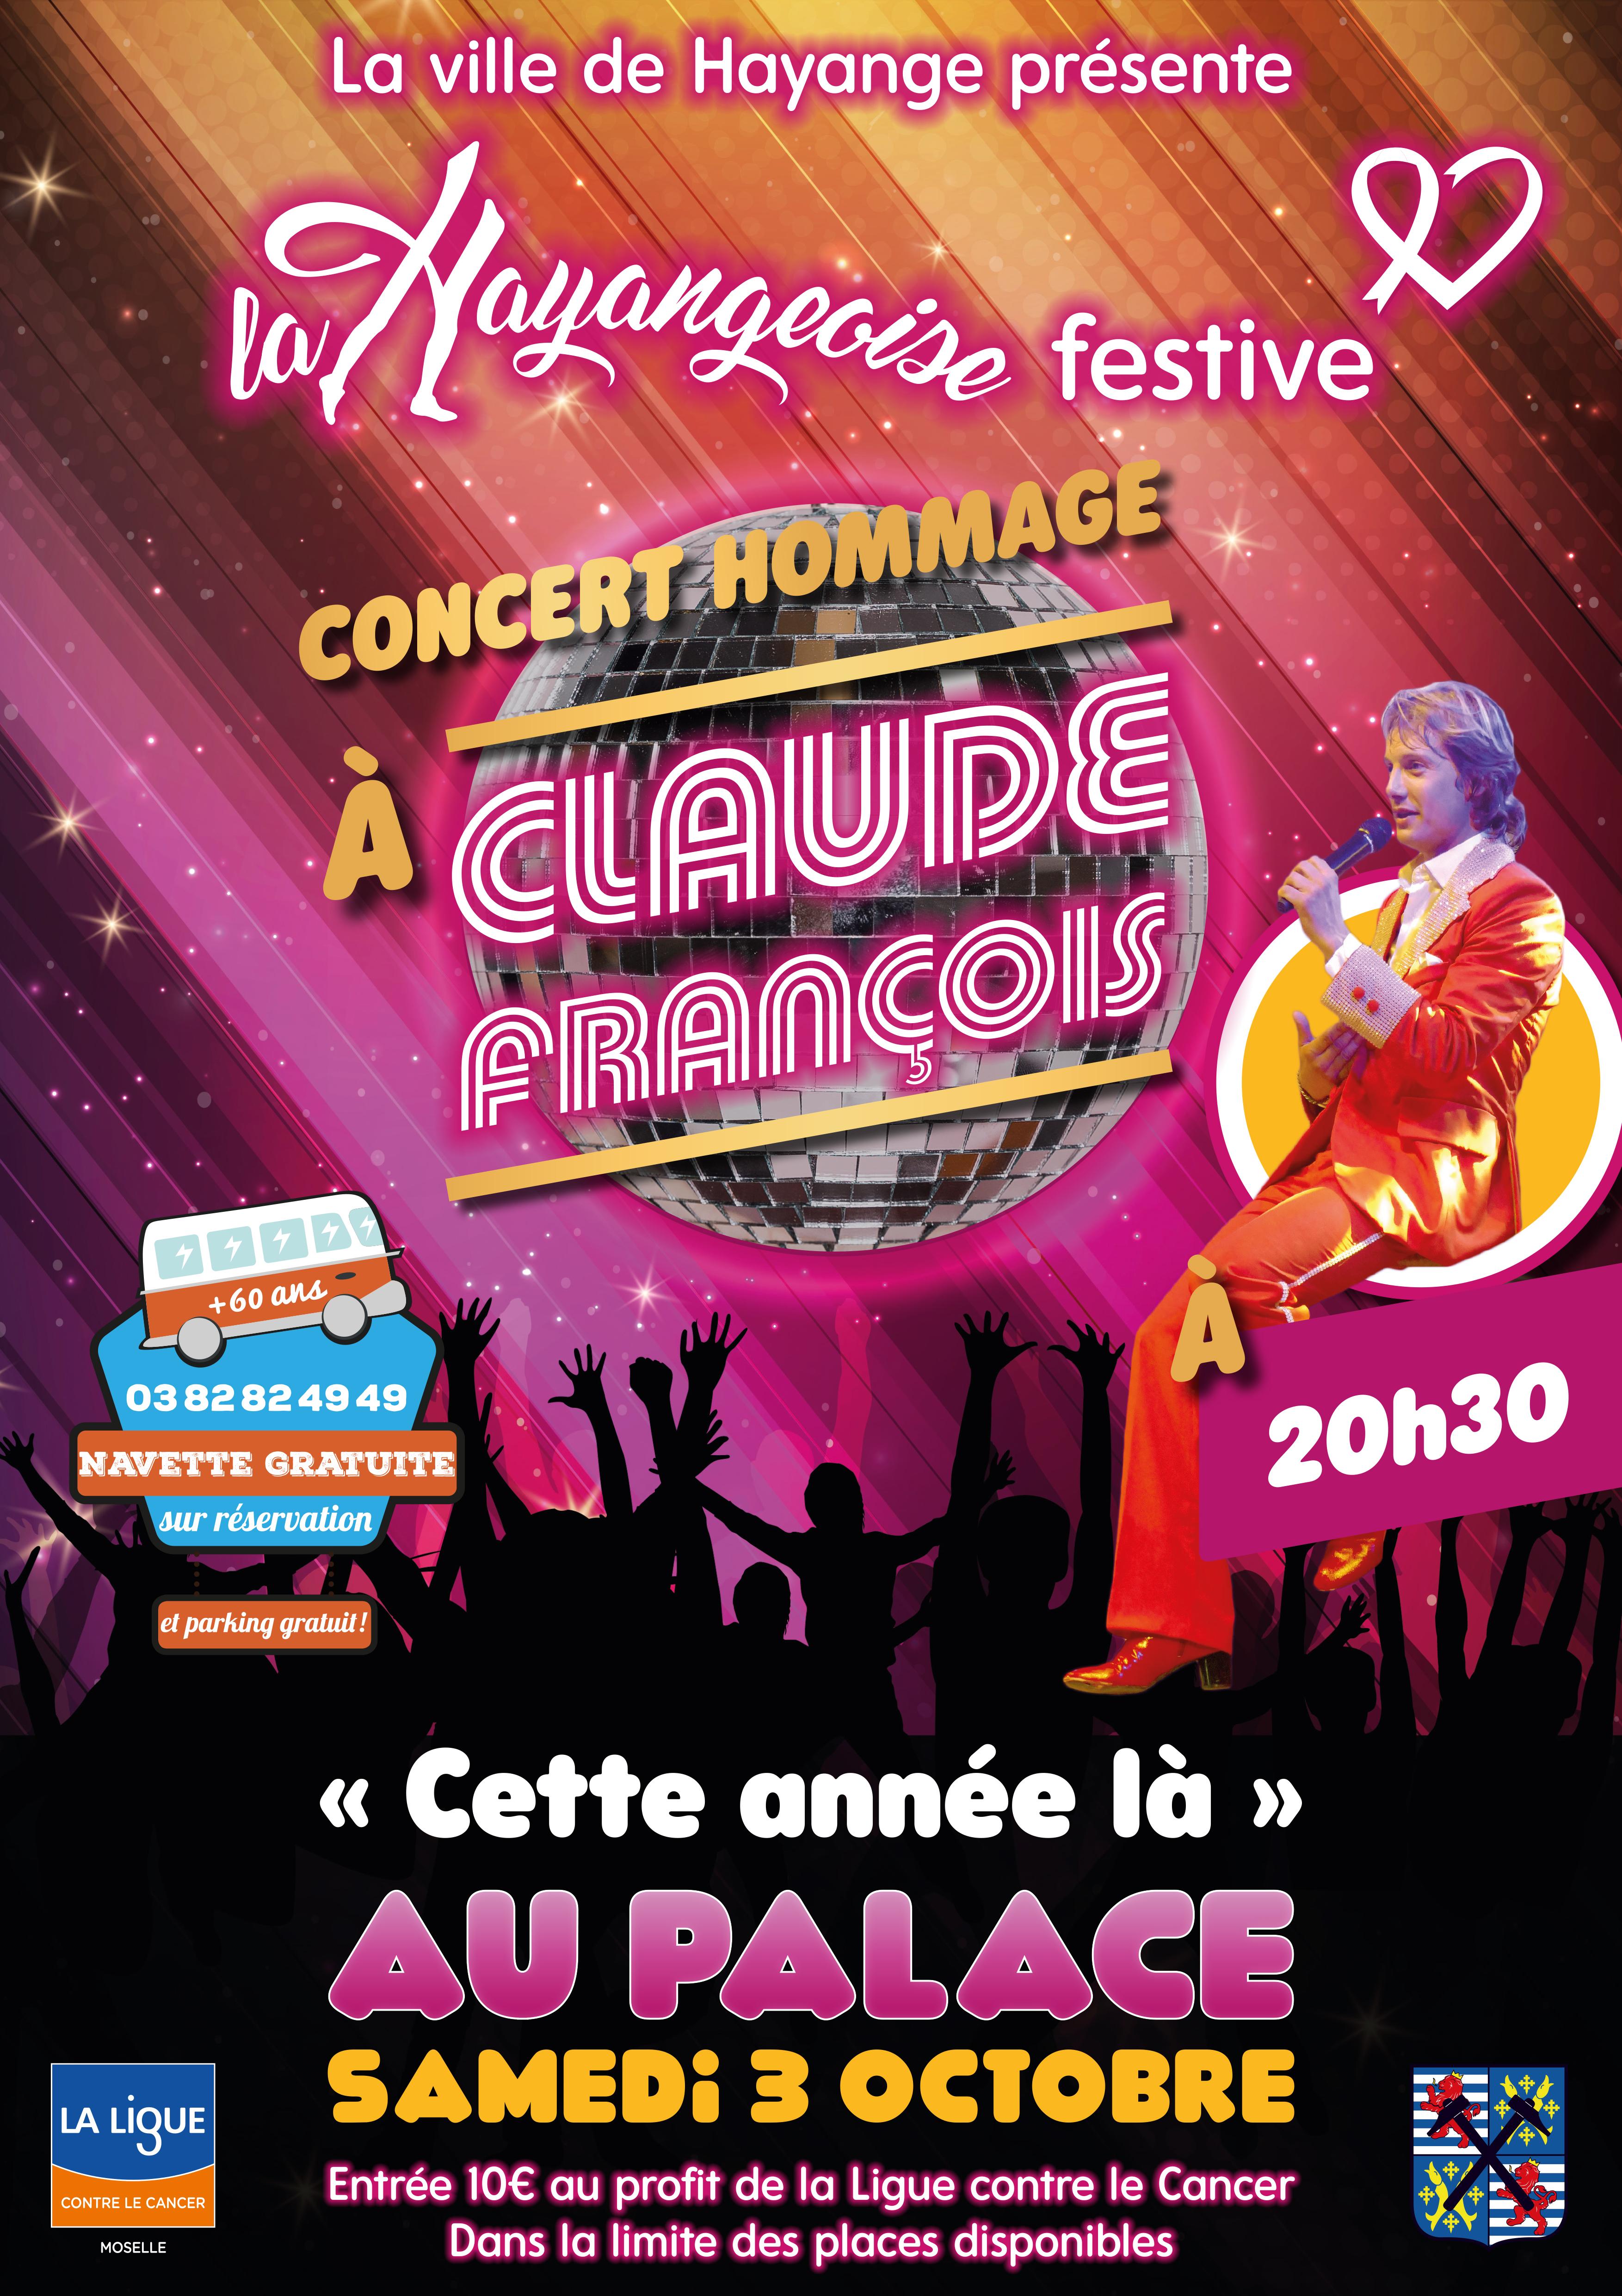 Affiche Hayangeoise Festive